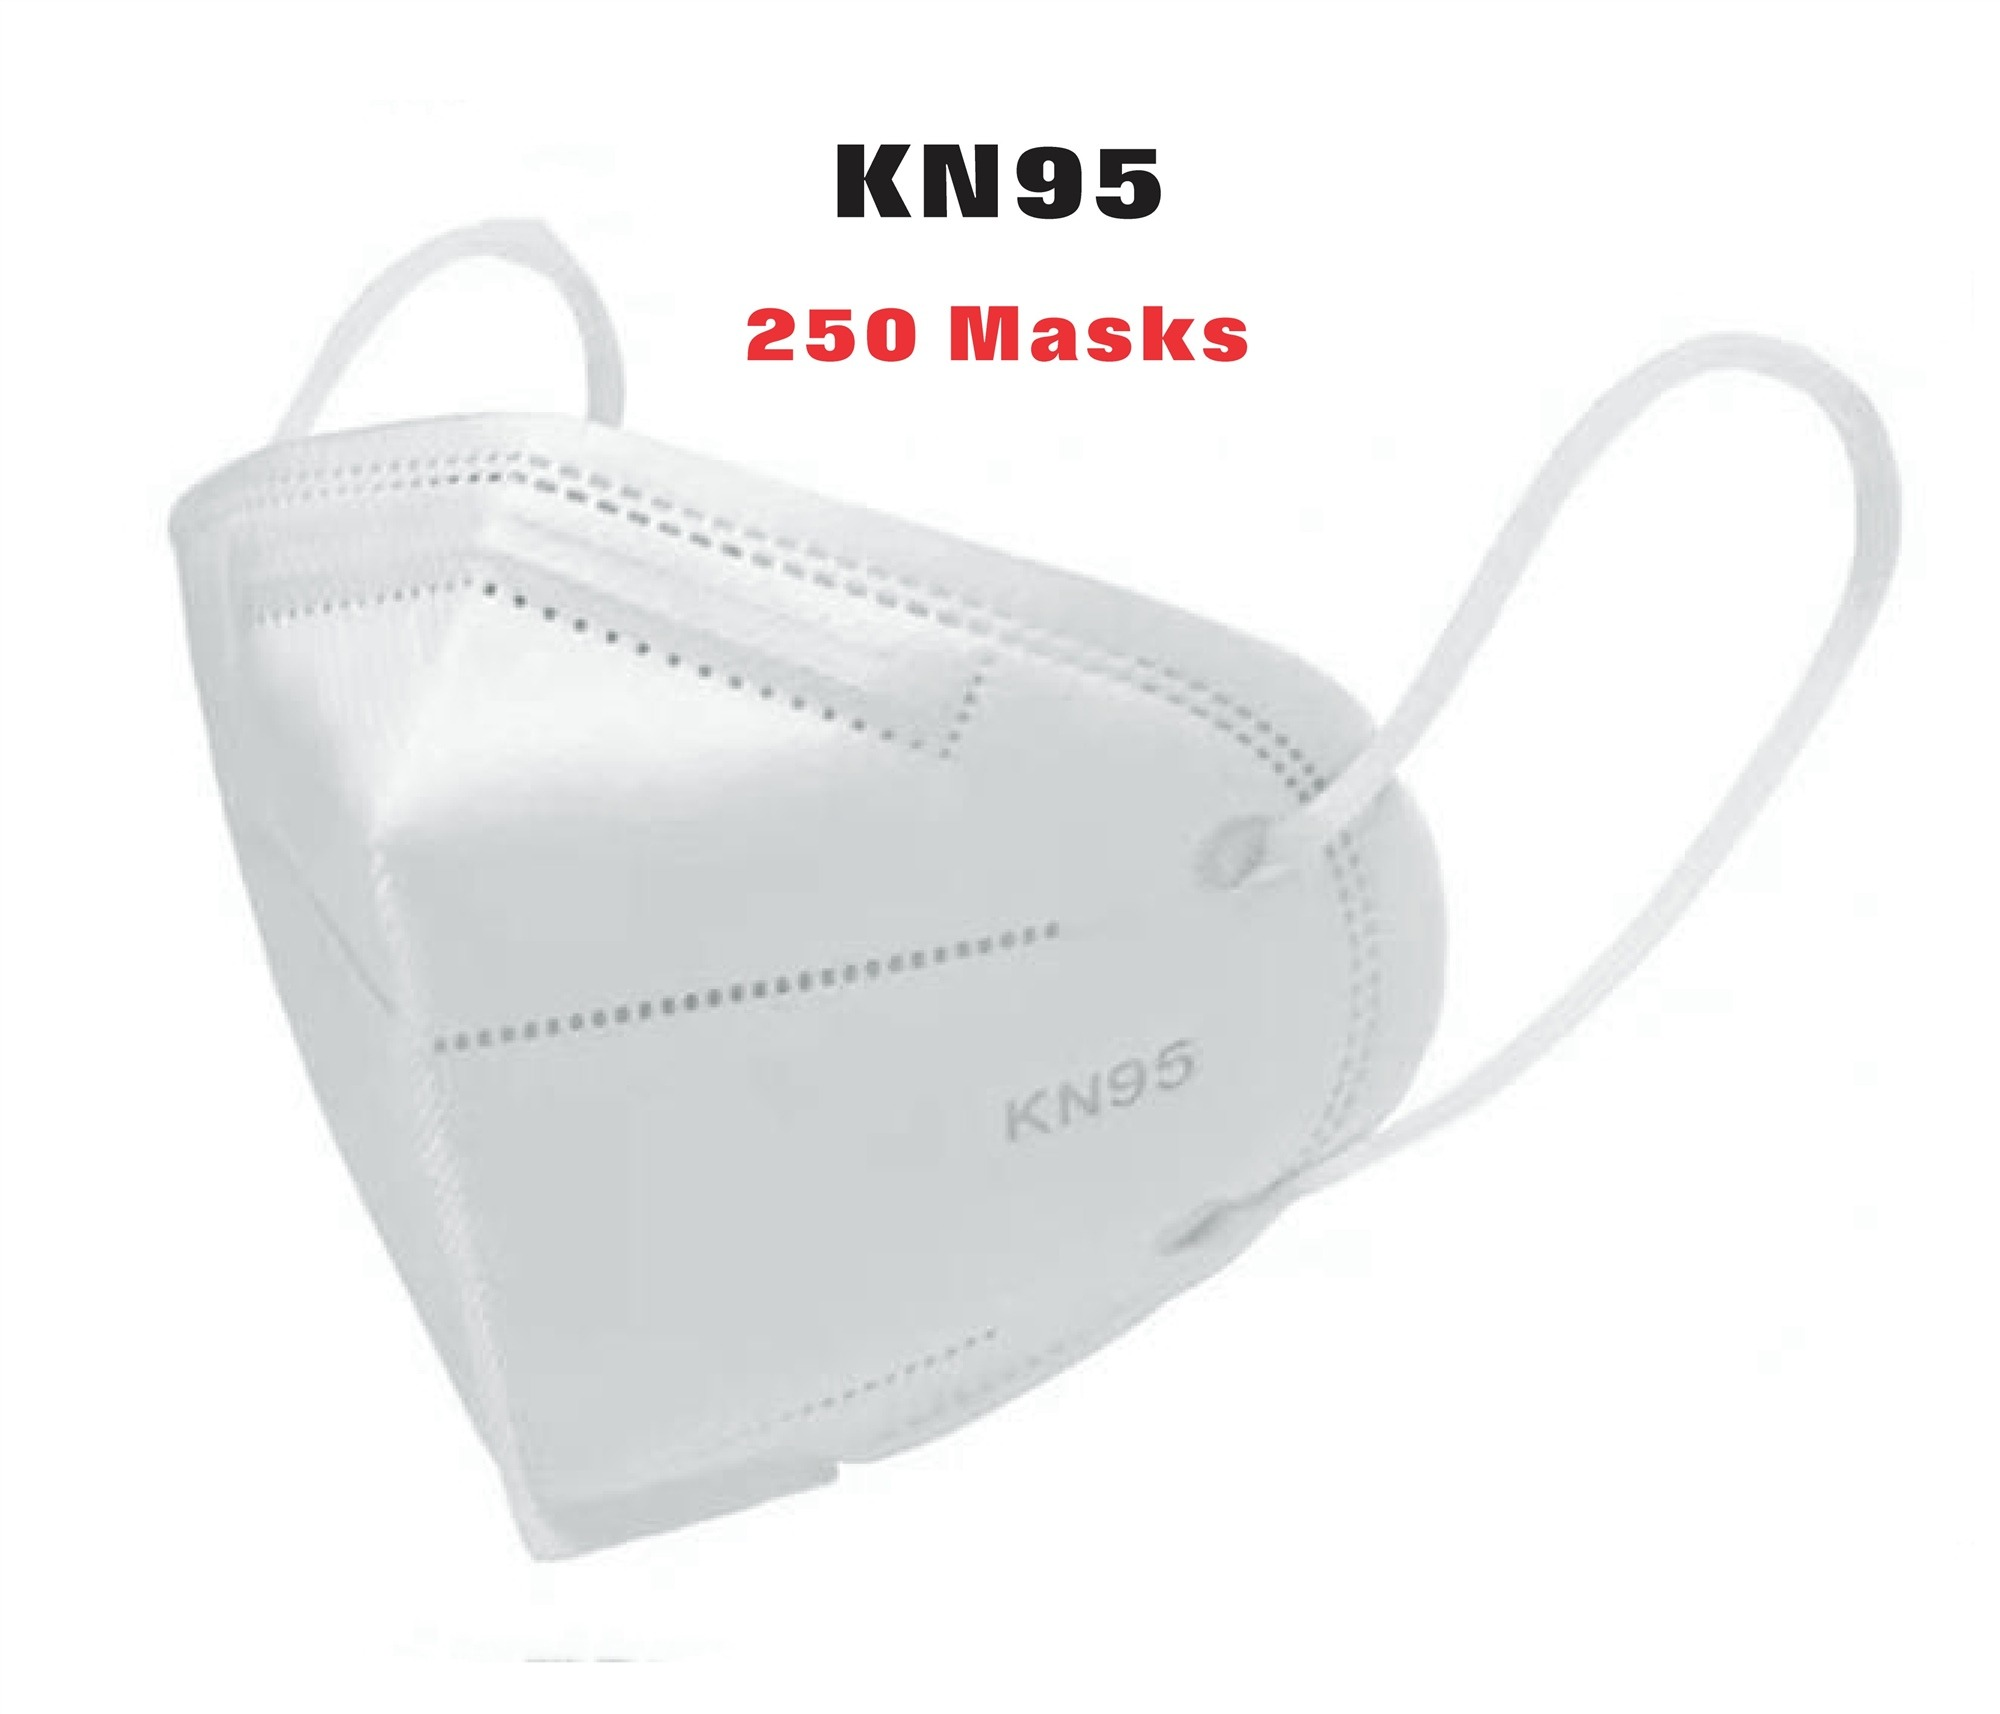 CanGard Care - KN95 250 Masks